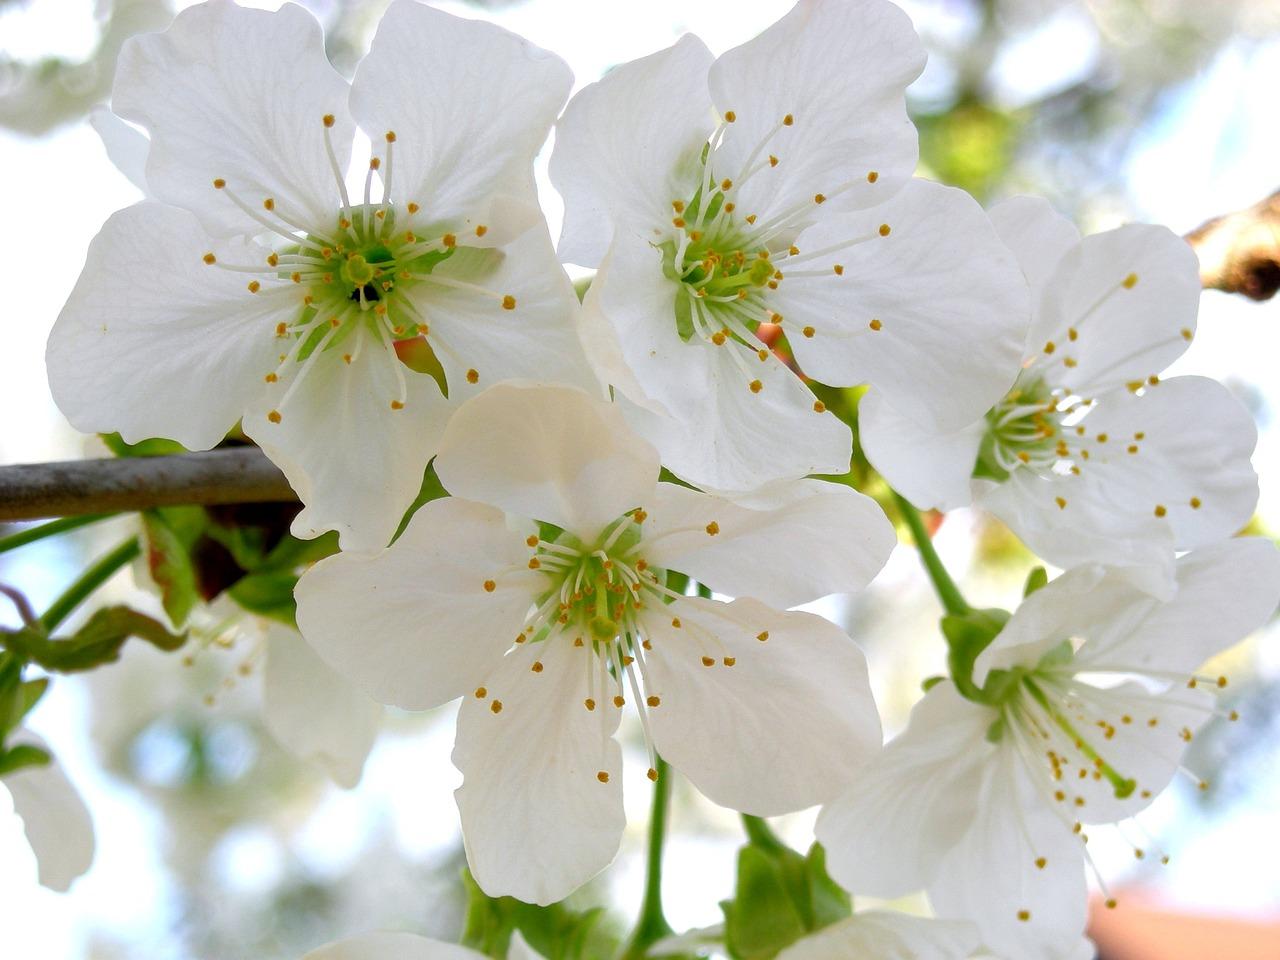 картинки с цветущими вишнями